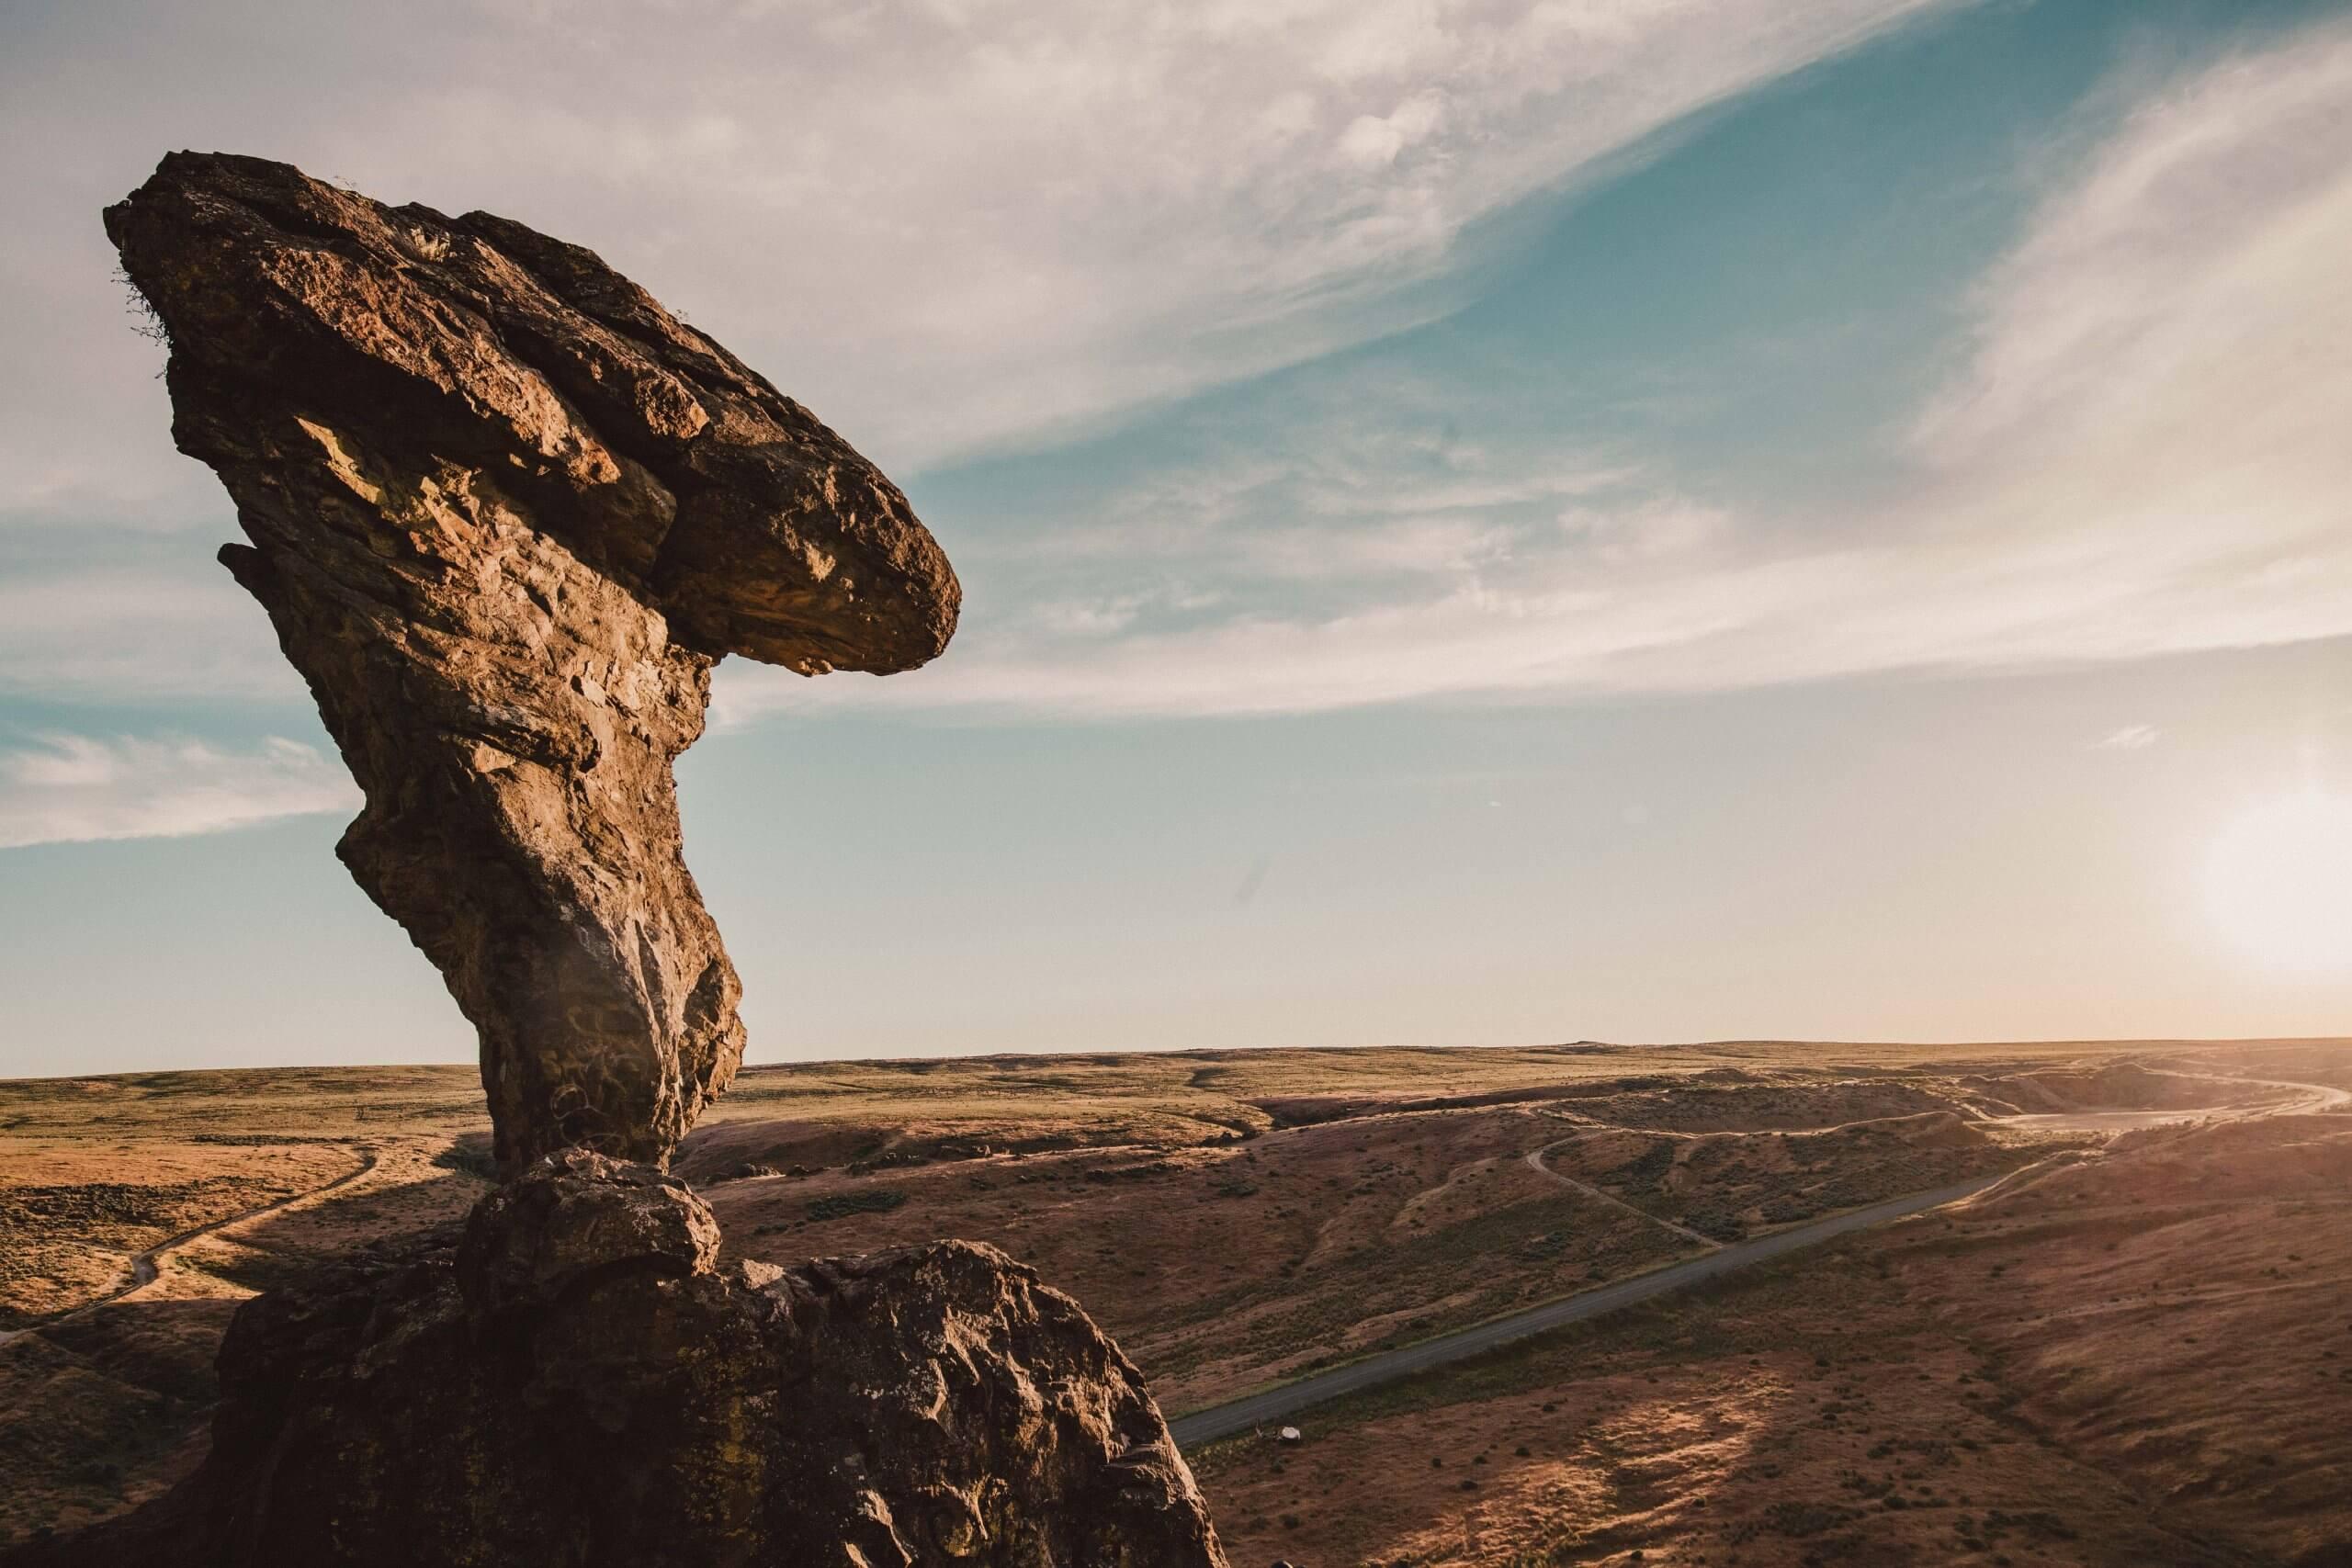 A view of Balanced Rock at sunset.